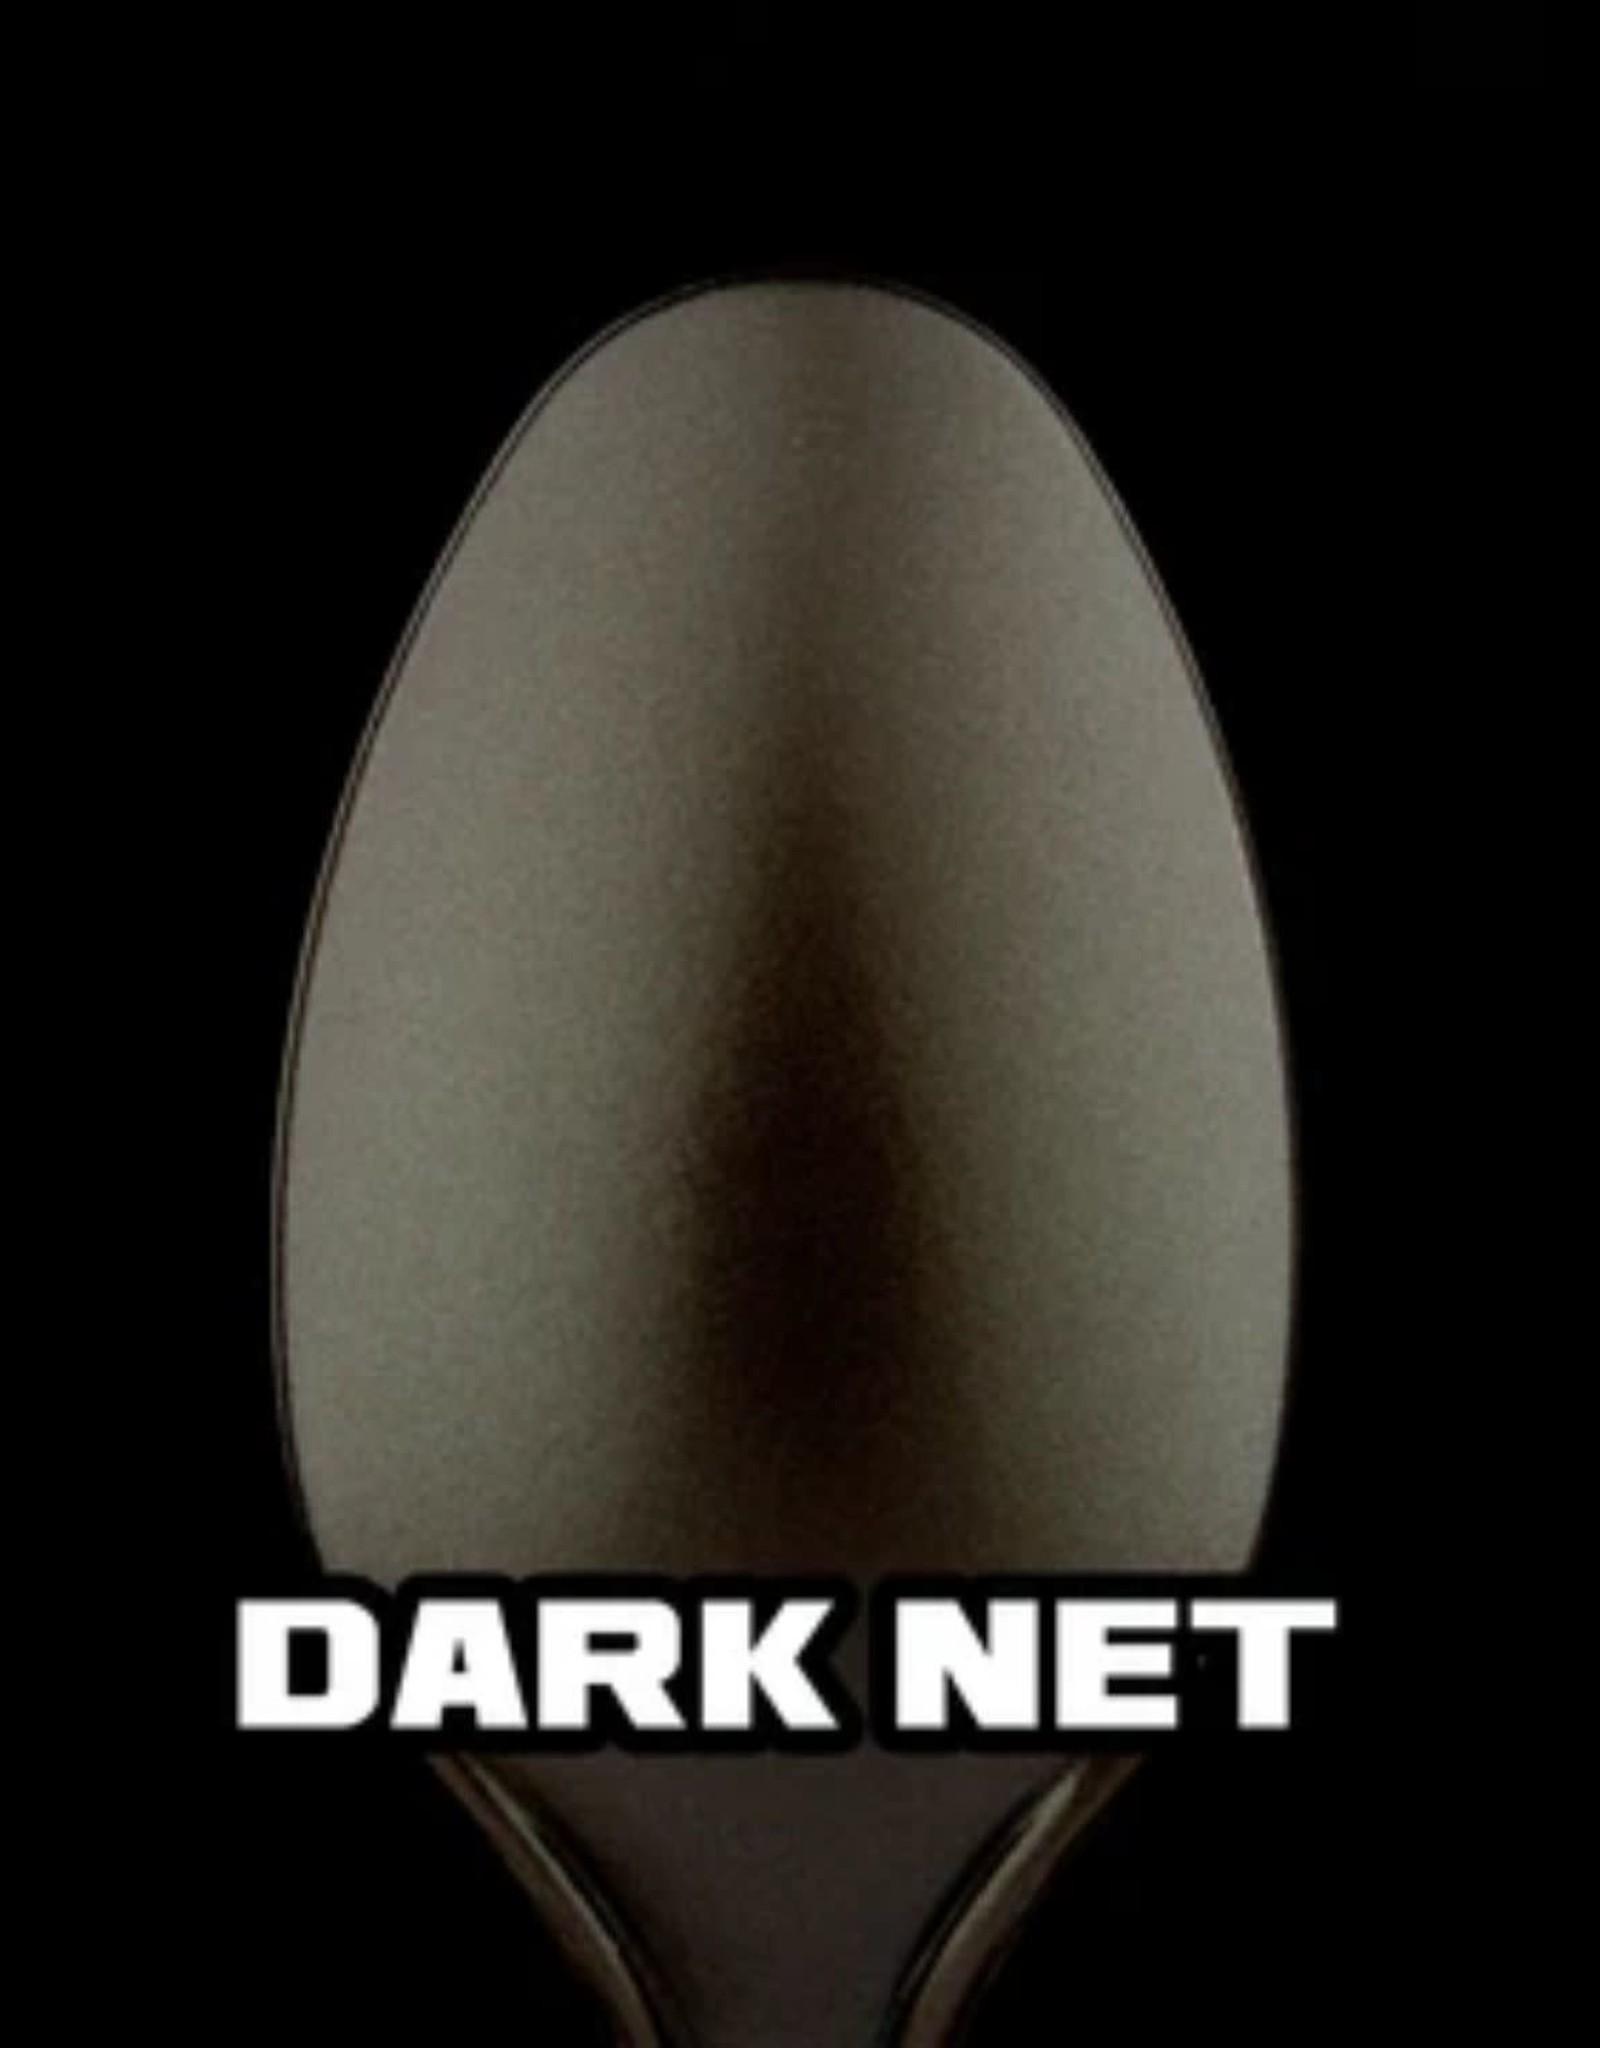 Turbo Dork Dark Net - Turboshift